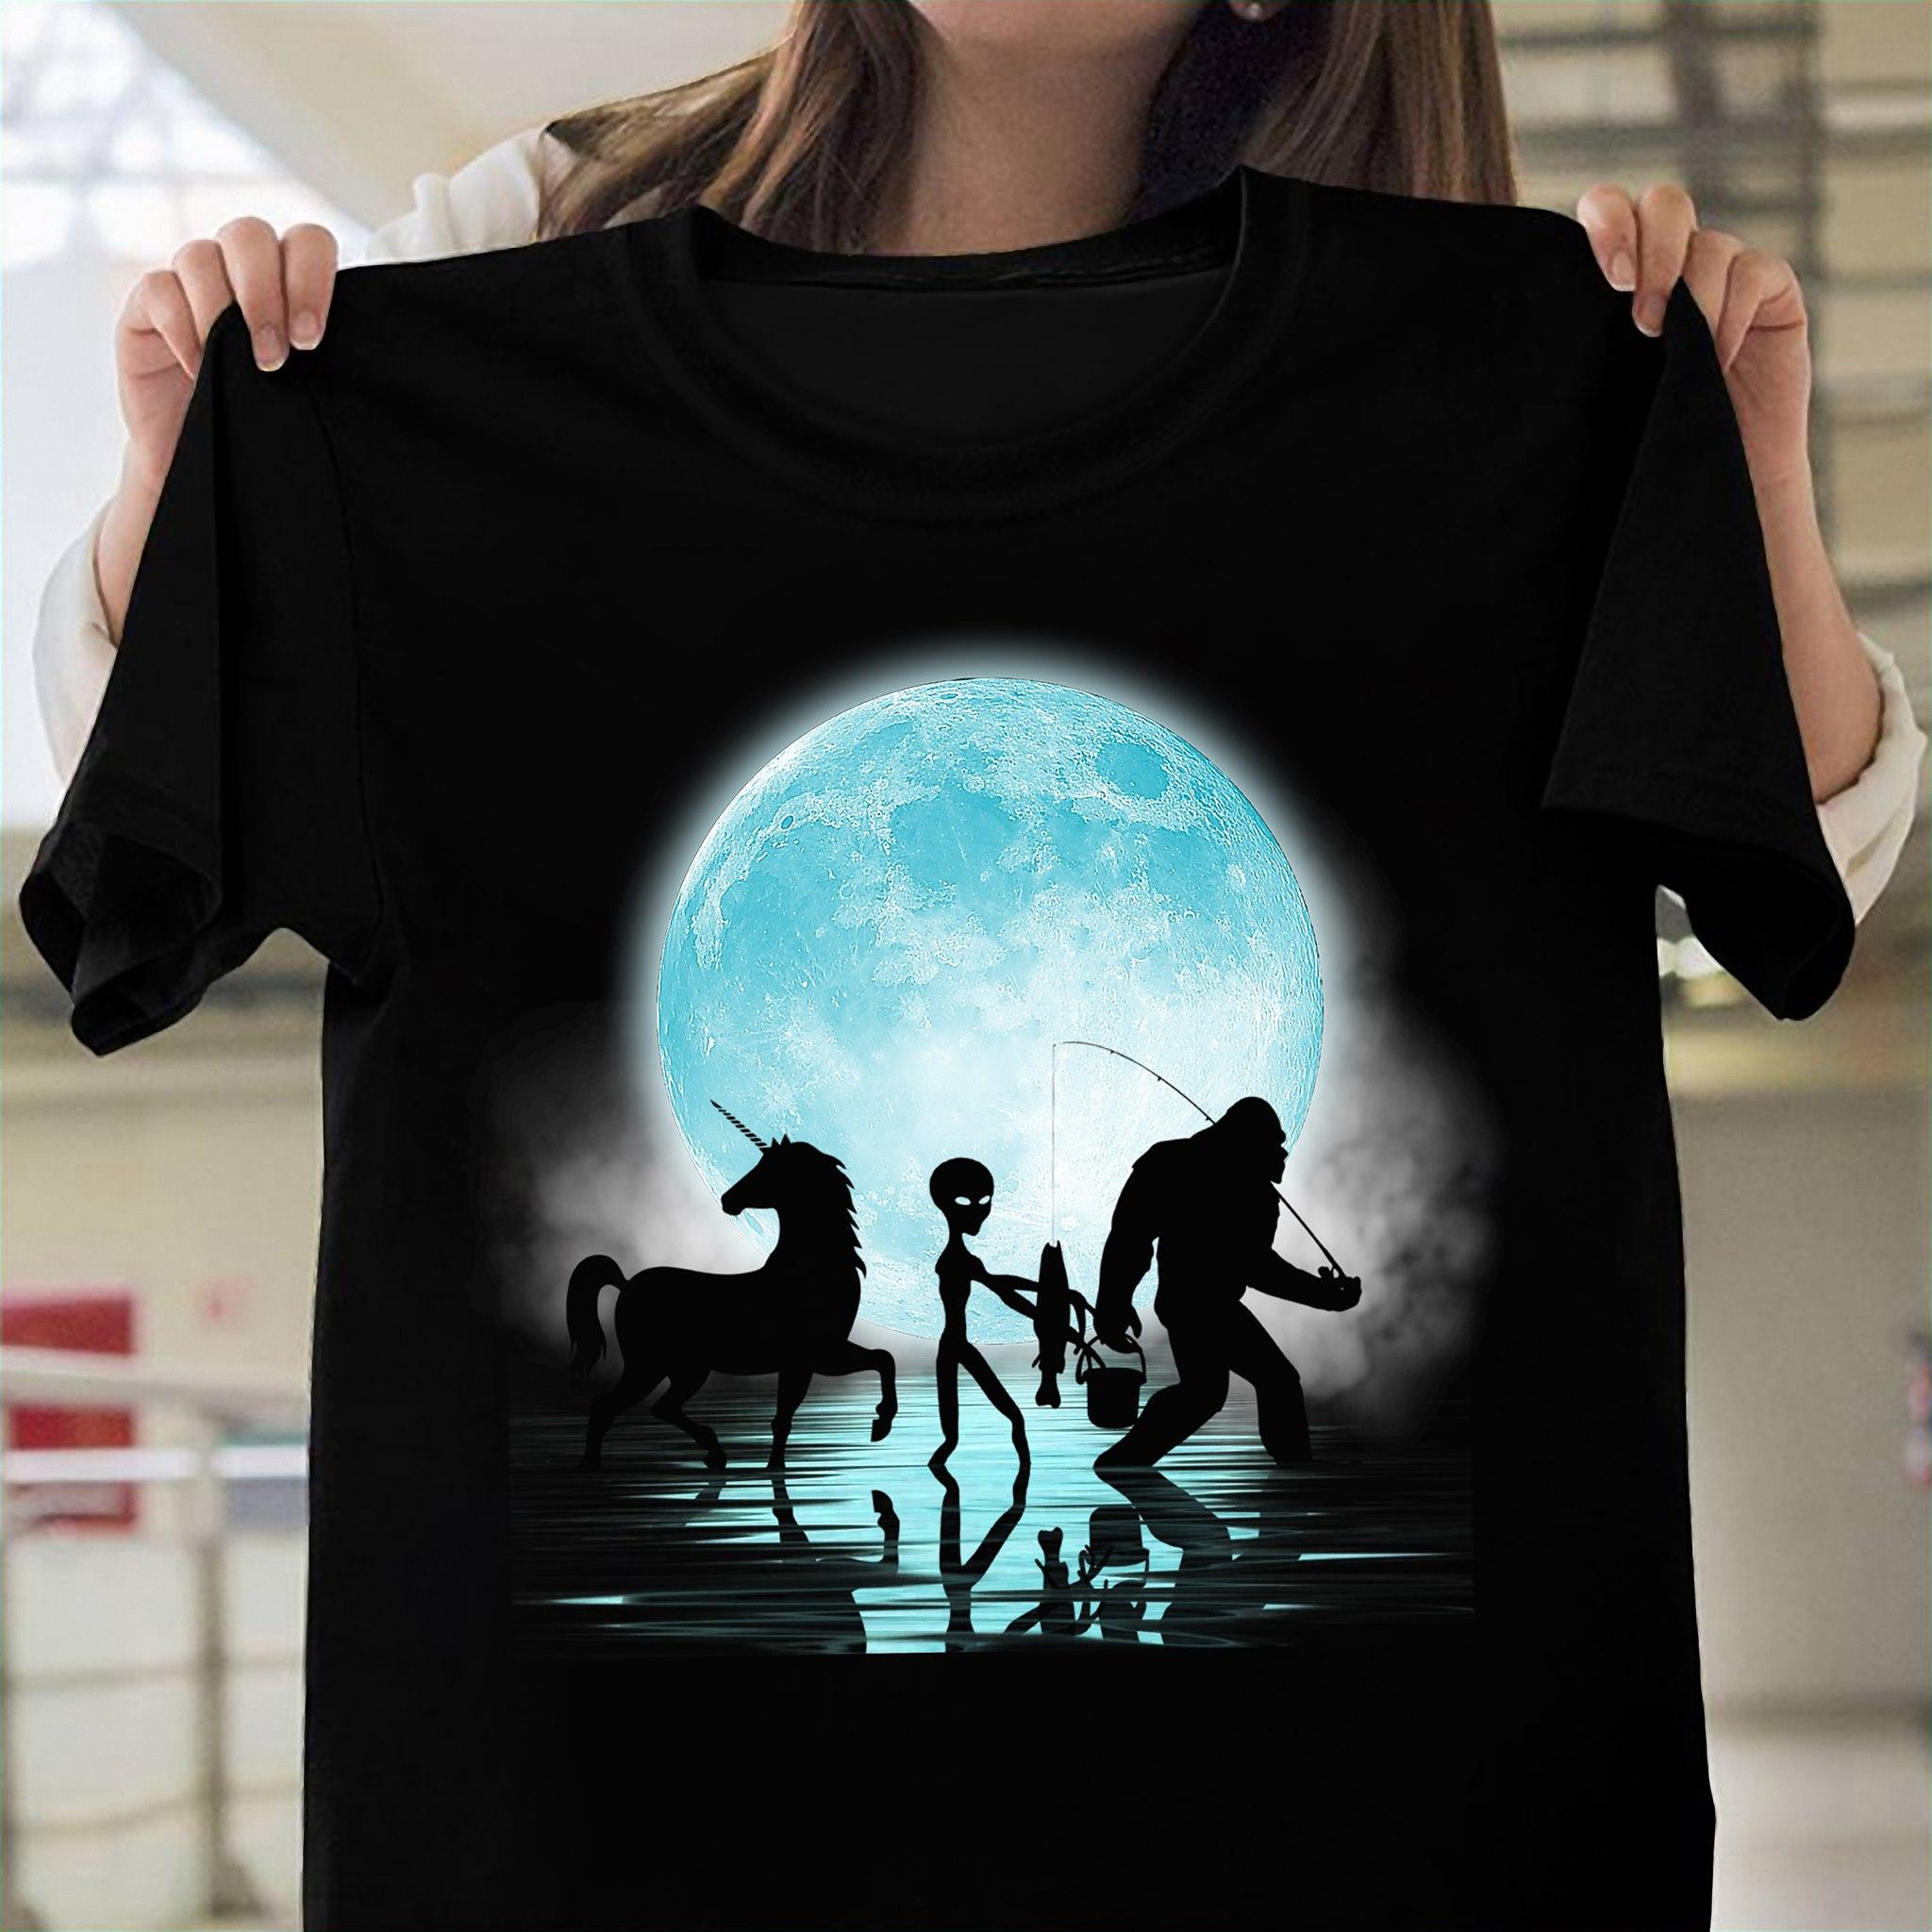 Big Foot Shirt Fishing With Alien Unicorn